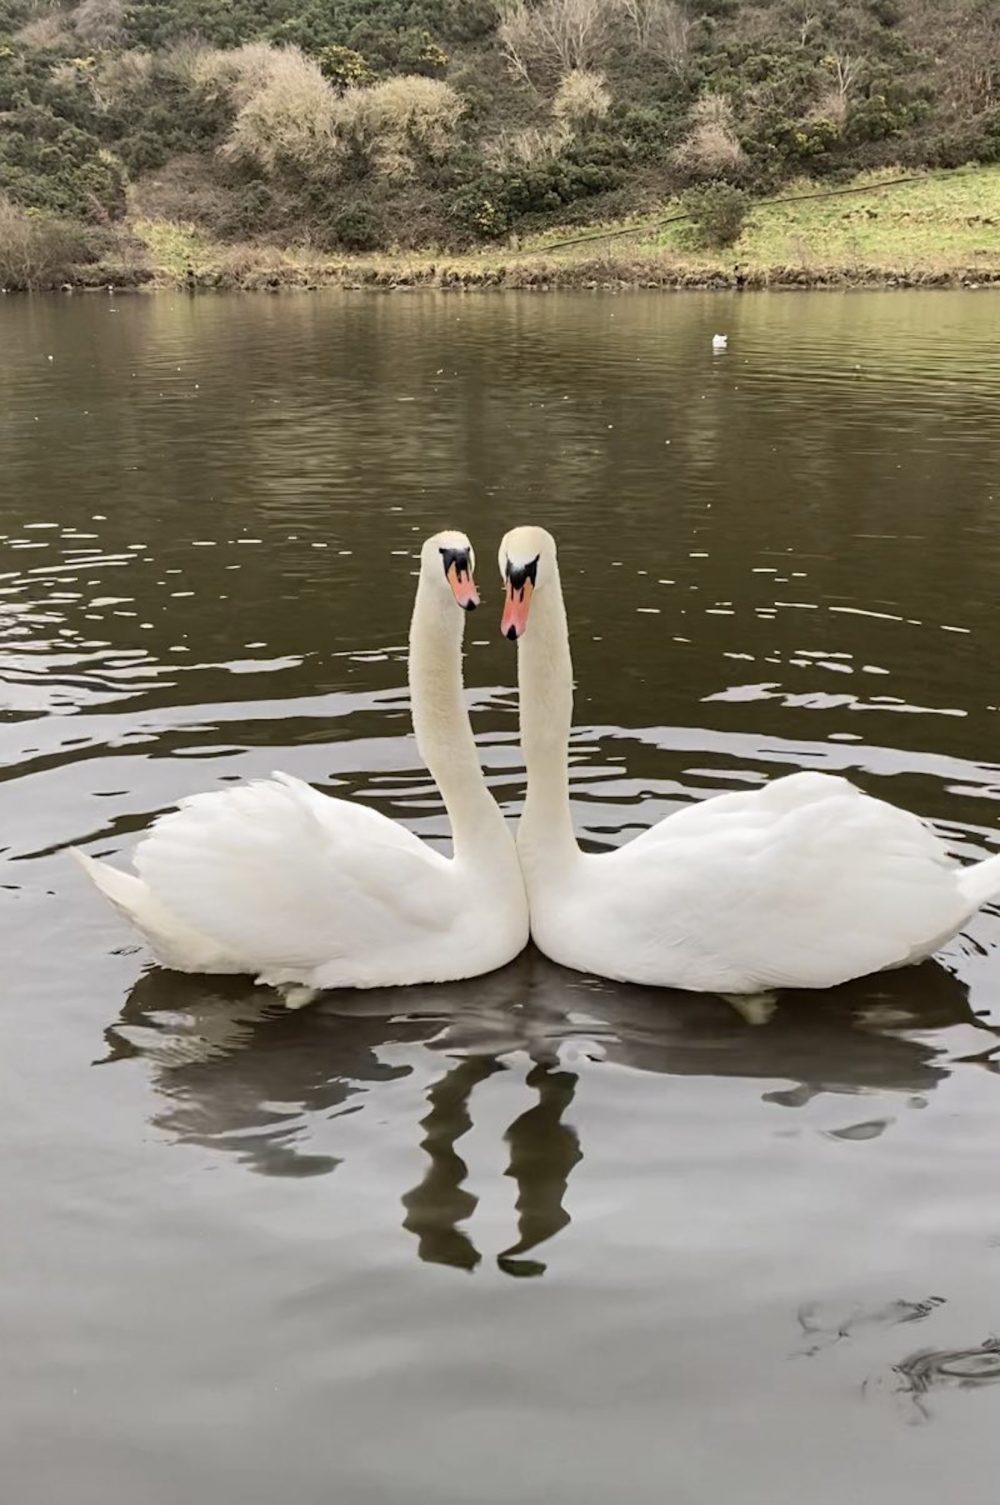 The swans staring at Maeve - Viral News Scotland